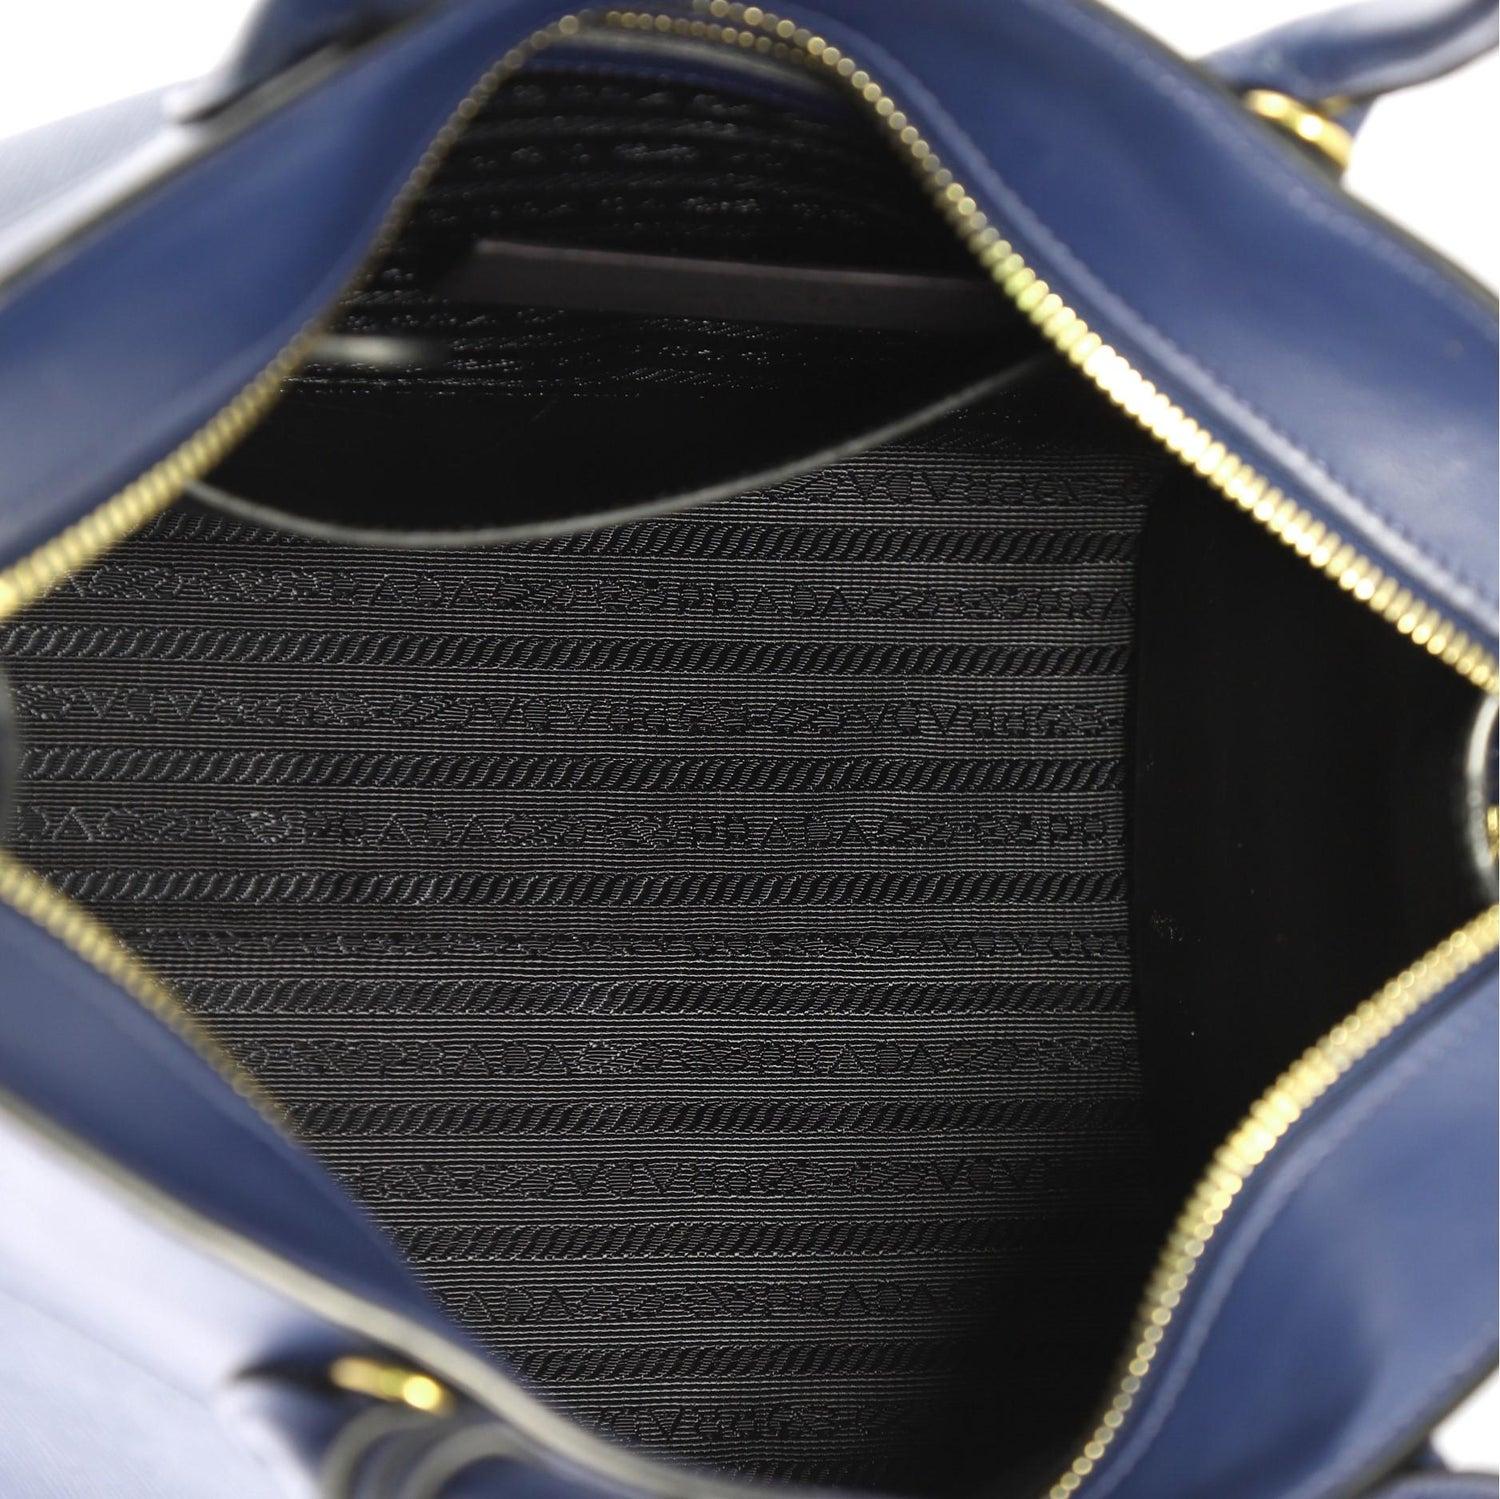 ad3767e0fba729 Prada Esplanade Handbag Saffiano Leather Medium For Sale at 1stdibs